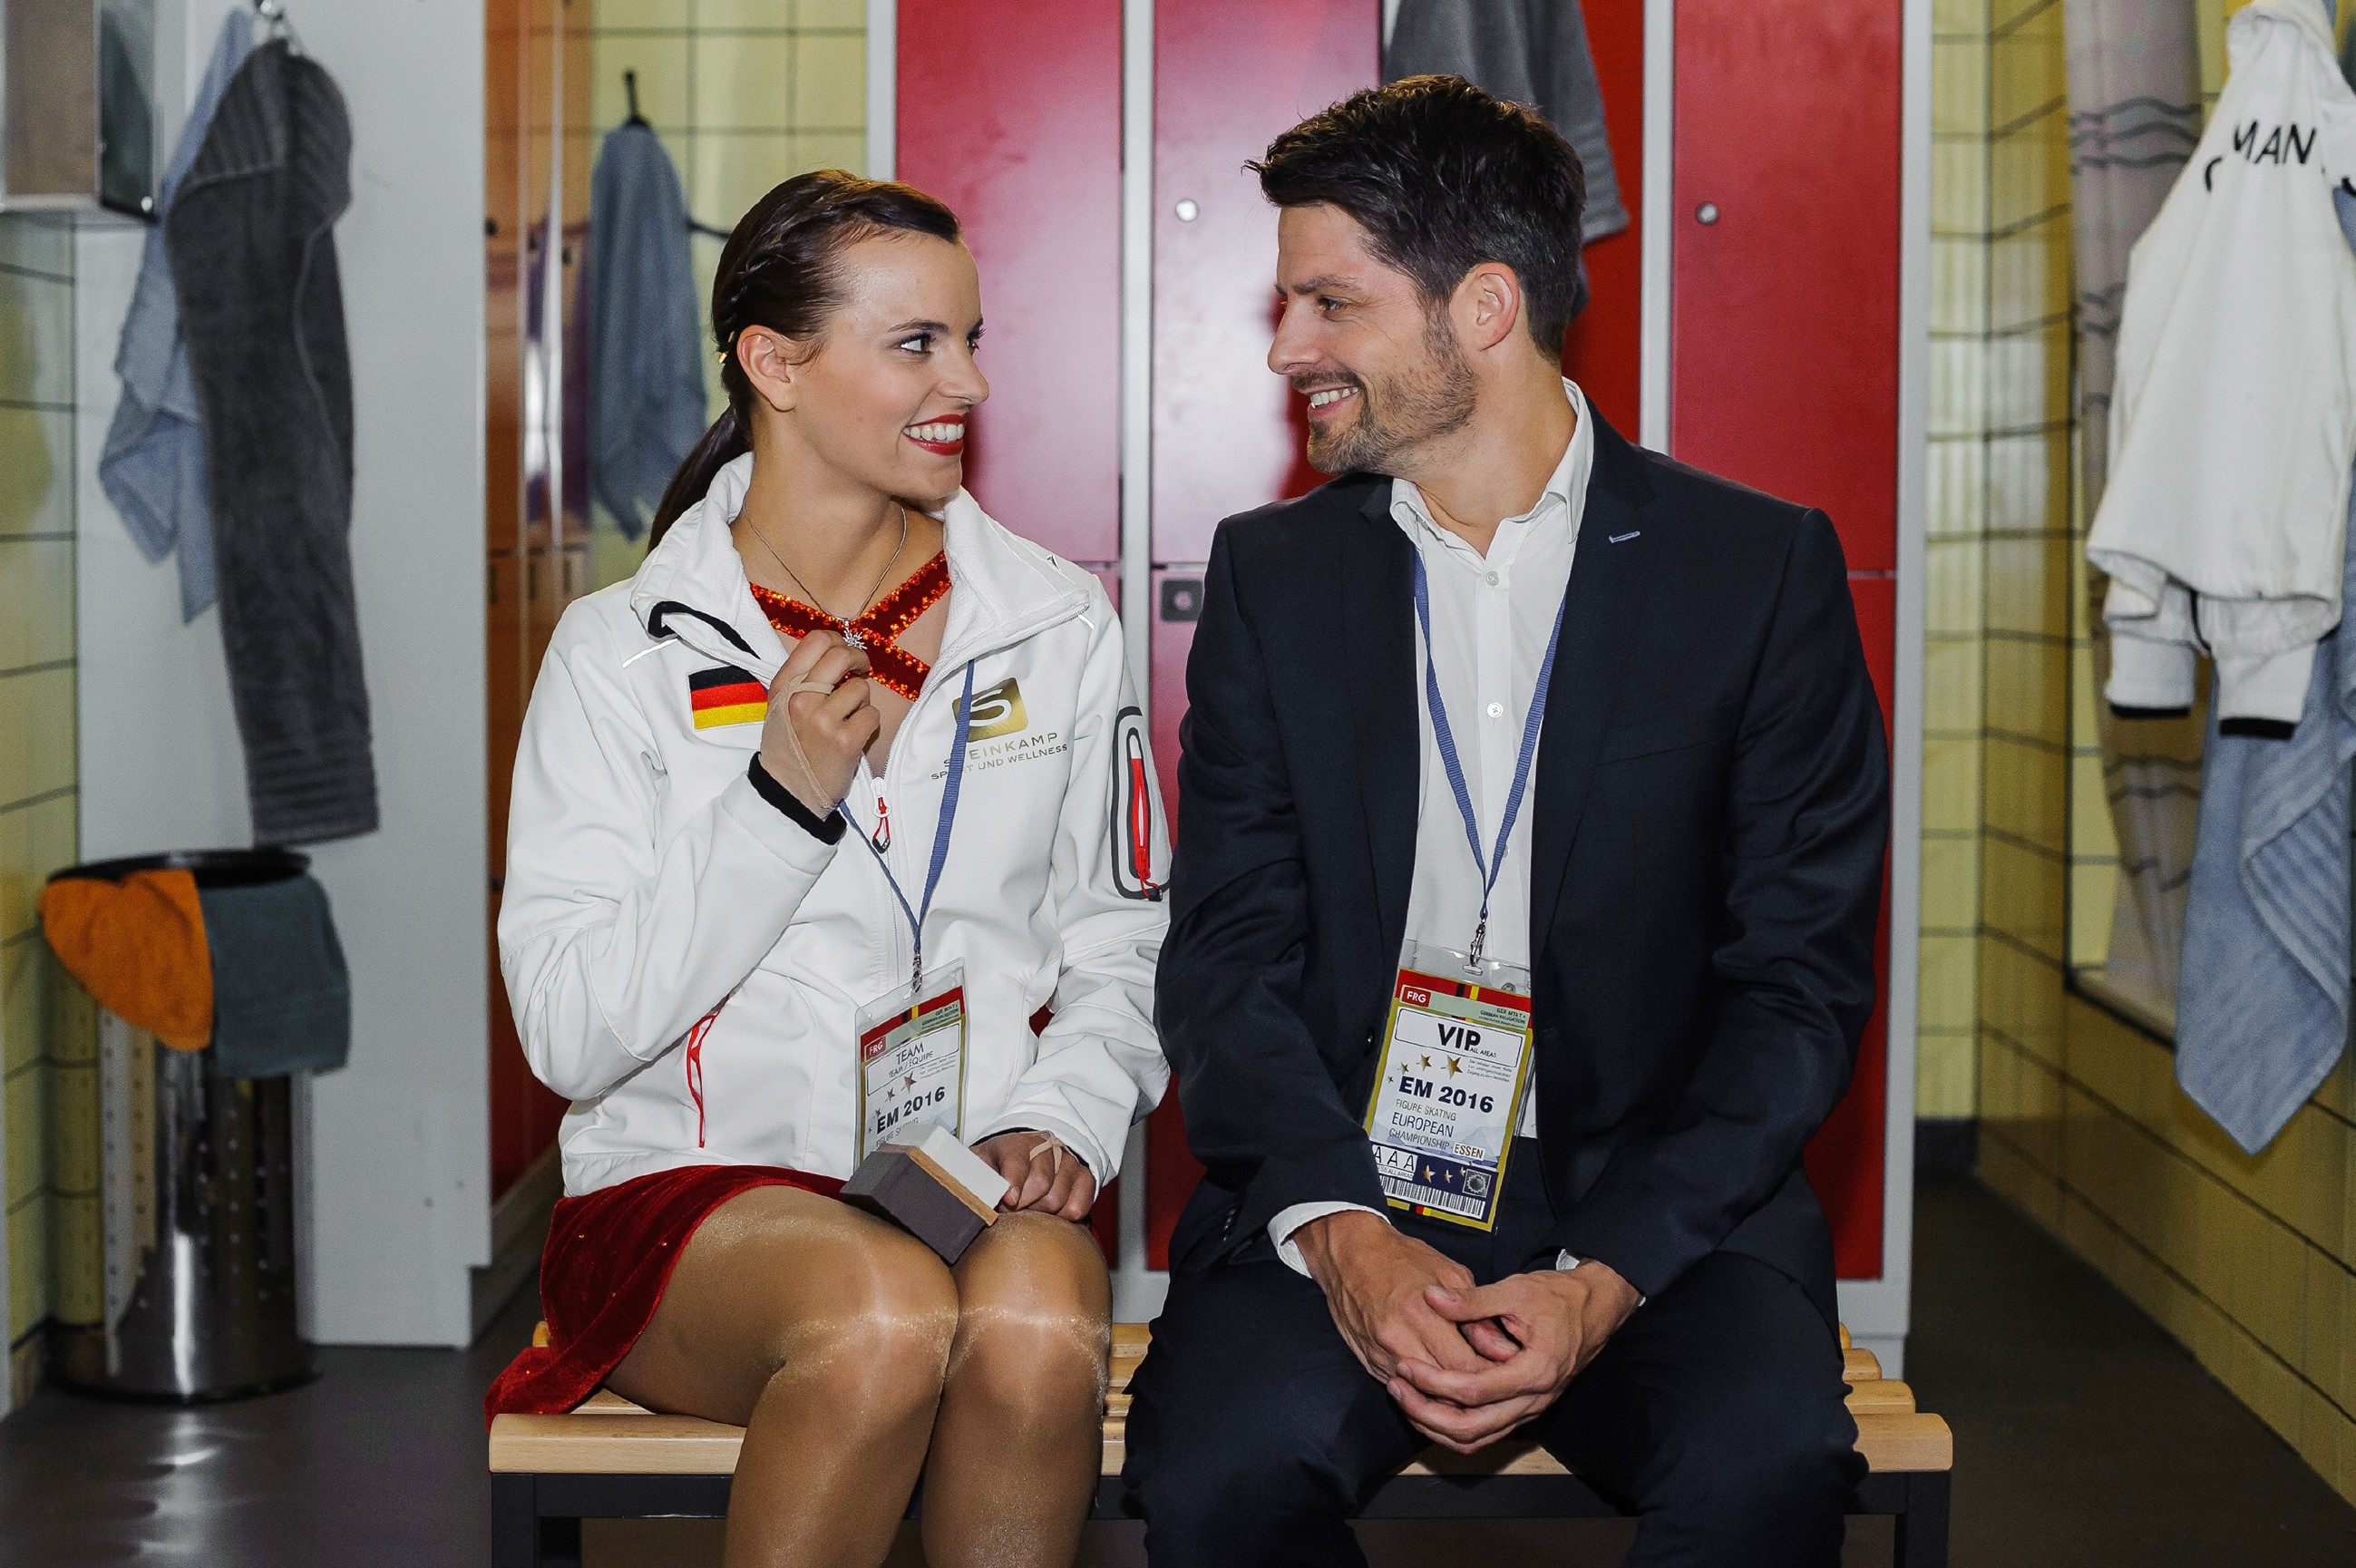 Michelle (Franziska Benz) startet dank Vincents (Daniel Buder) Unterstützung gestärkt in die EM. (Quelle: RTL / Julia Feldhagen)